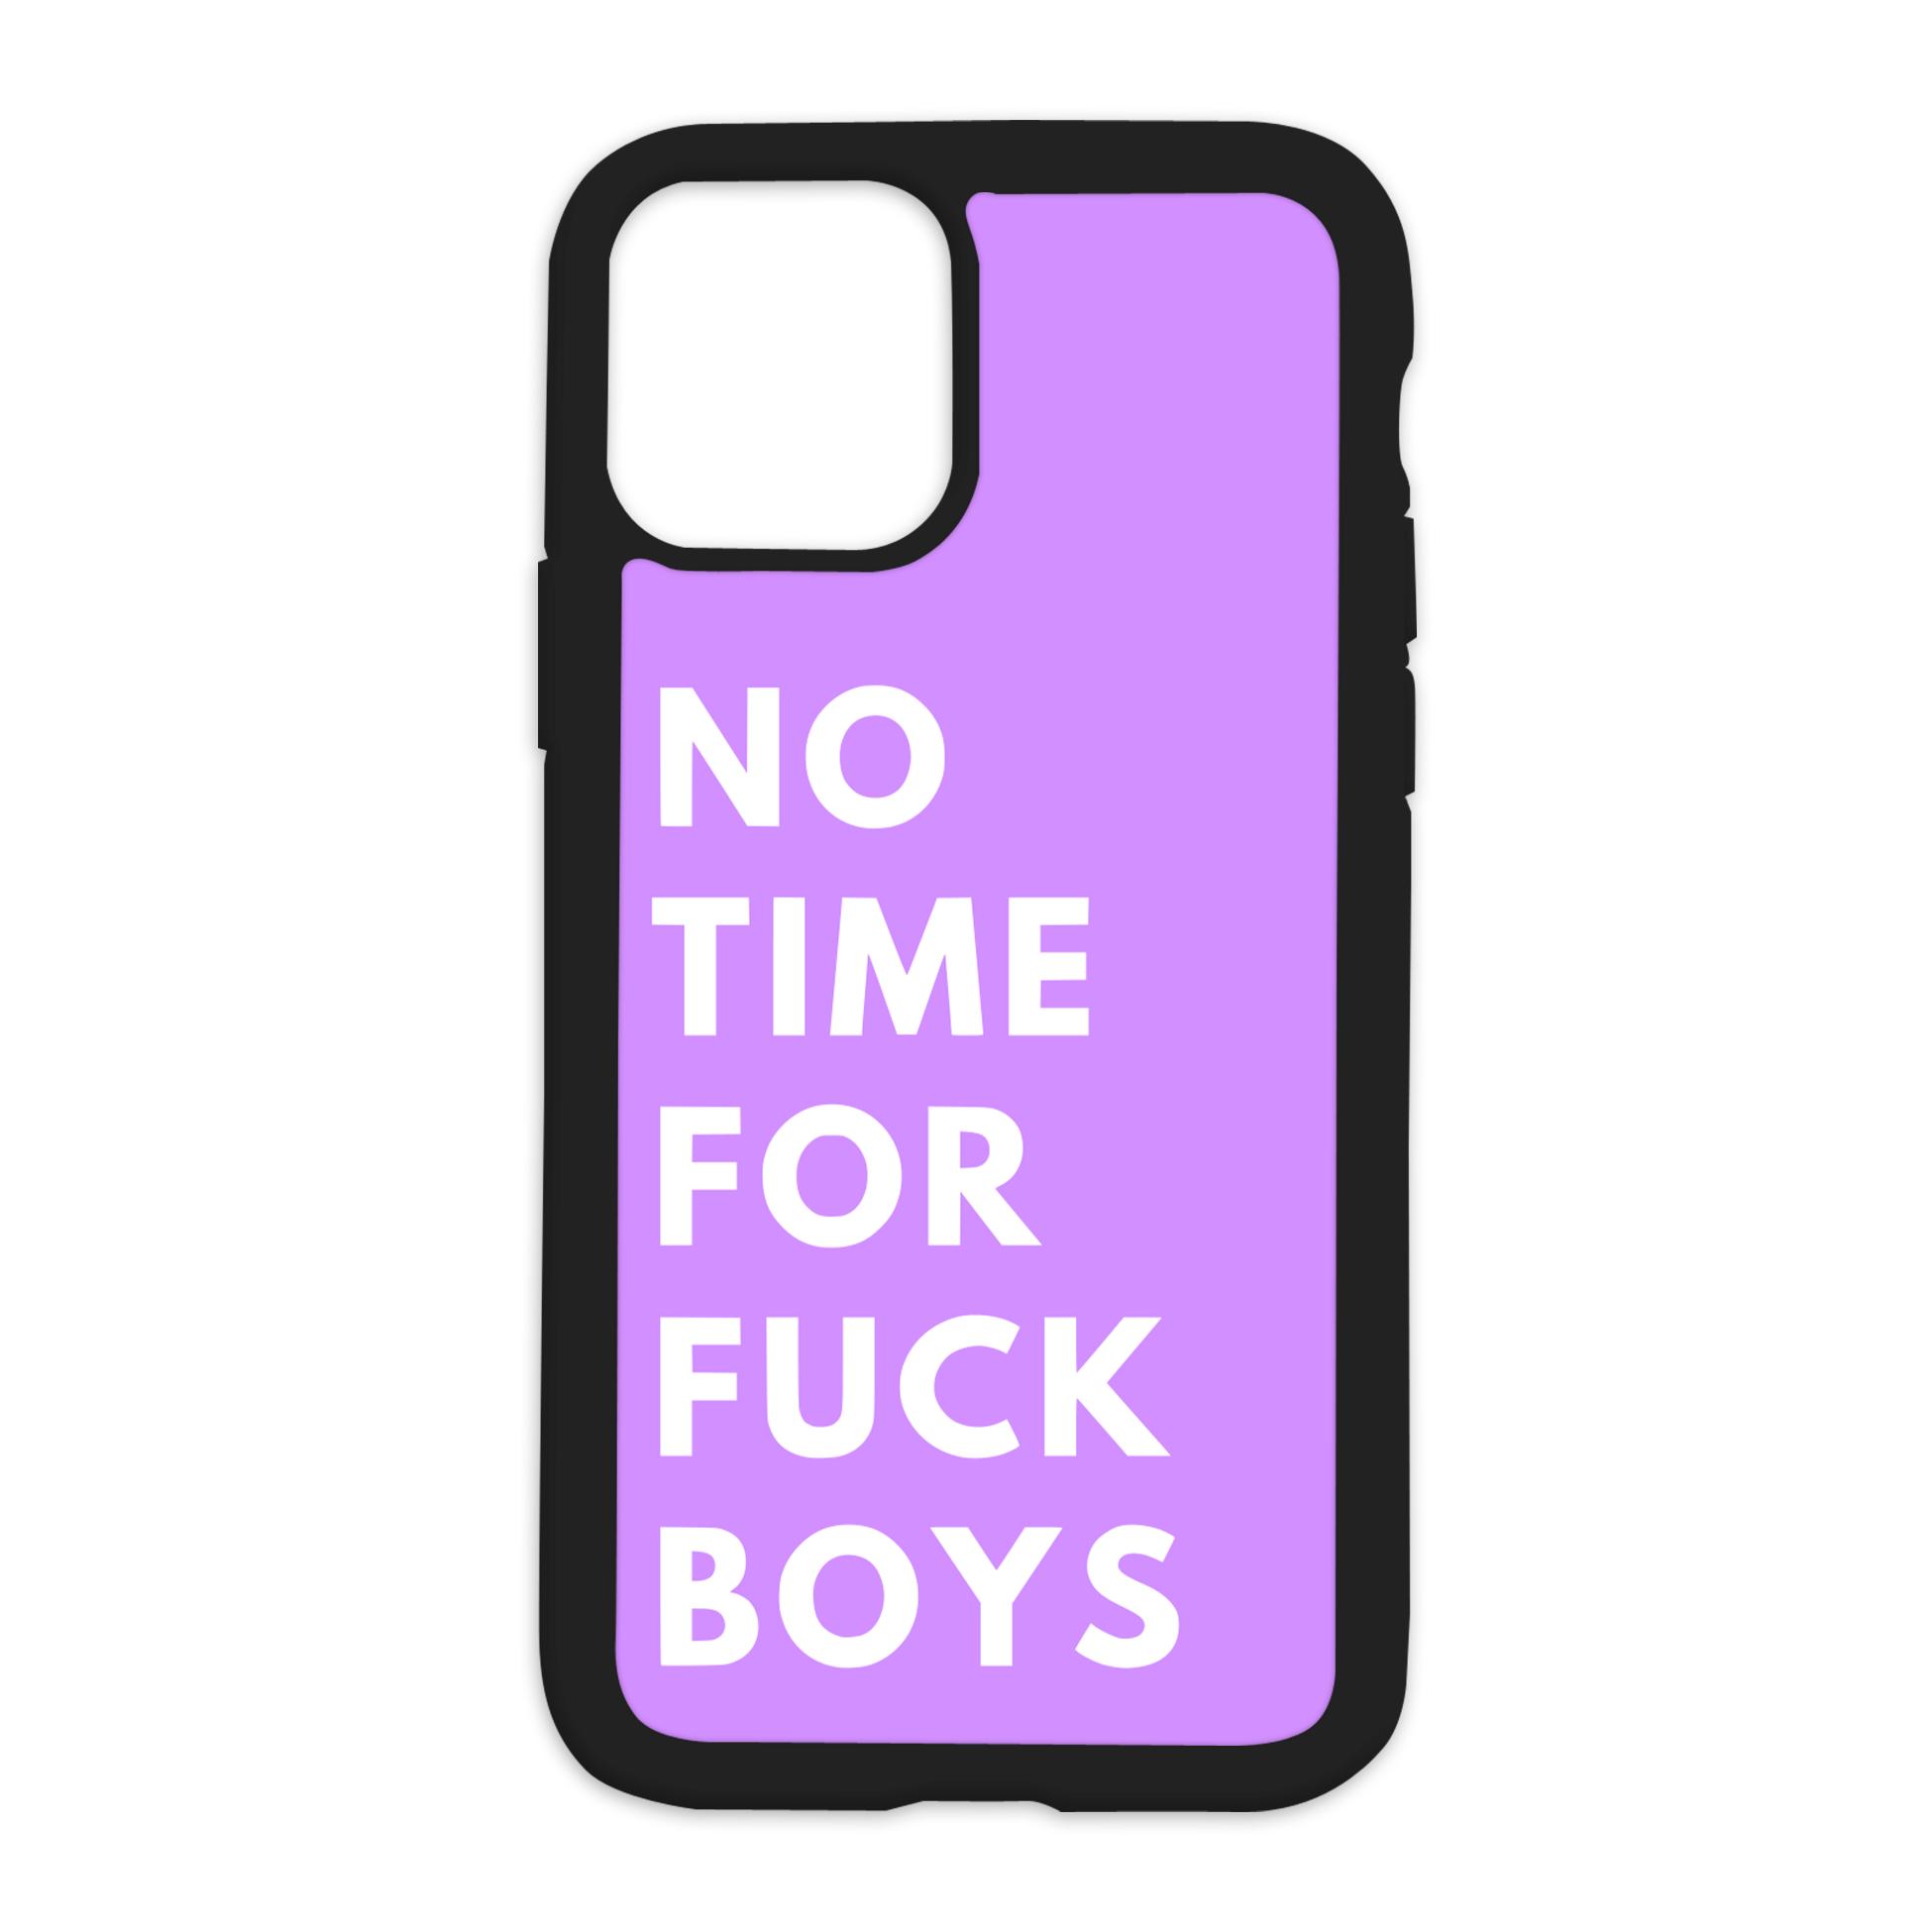 No Time For Fuck Boys Design On Black Phone Case - 7/8SE/2020 / Purple